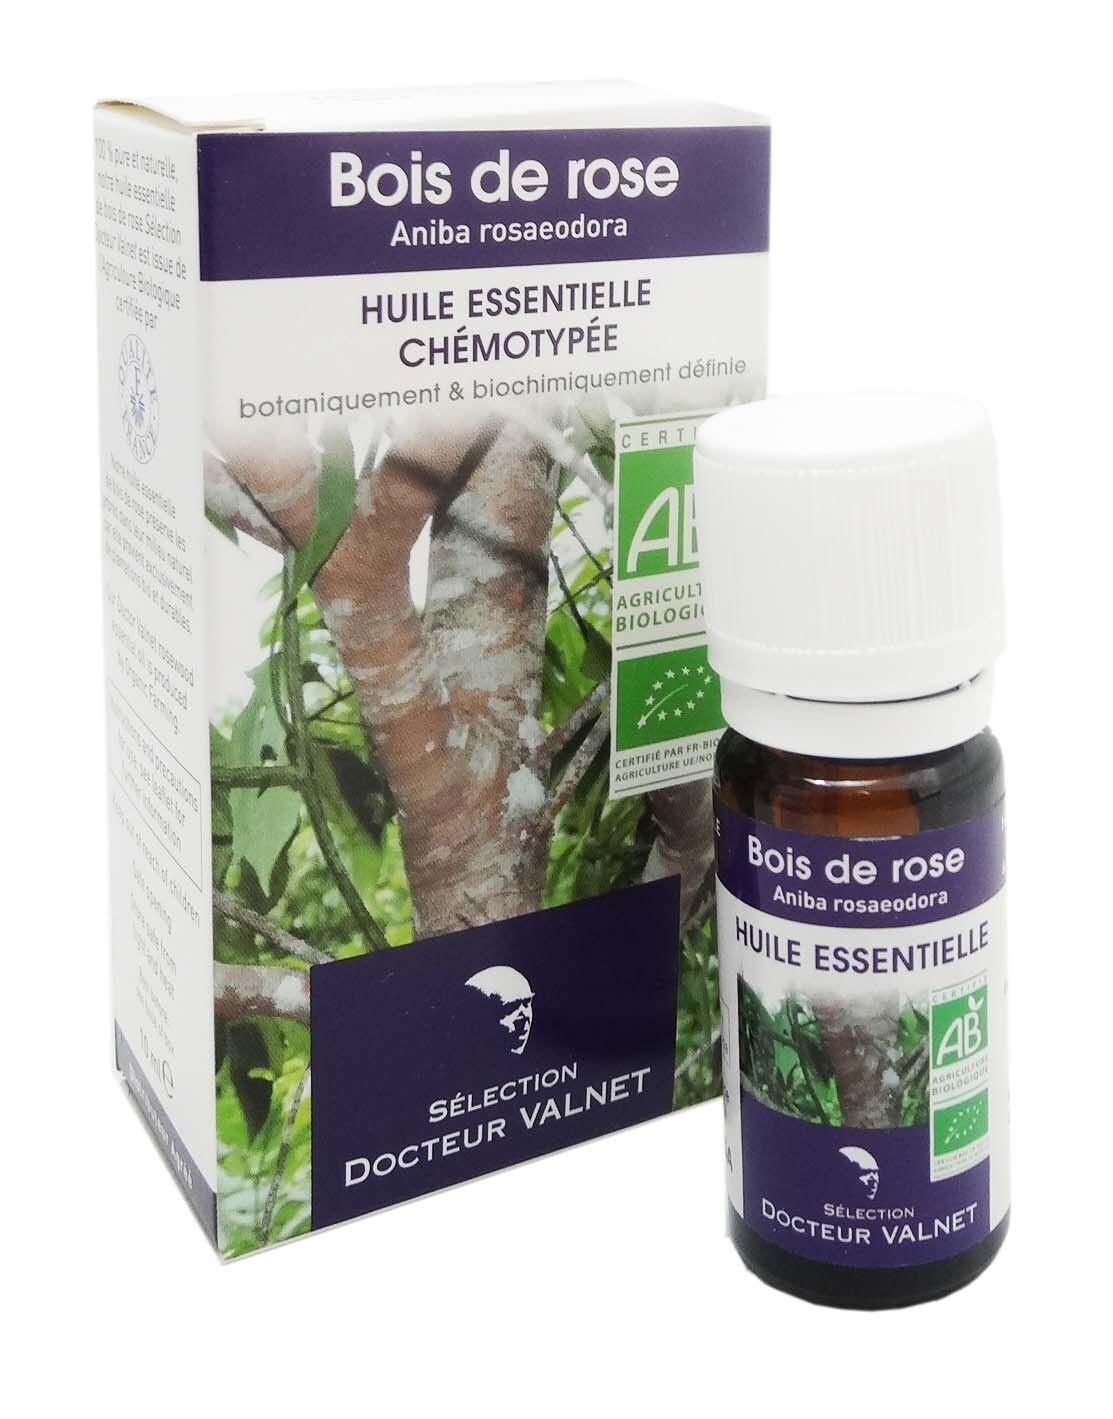 DOCTEUR VALNET Valnet huile essentielle chemotypee  bois de rose 10ml